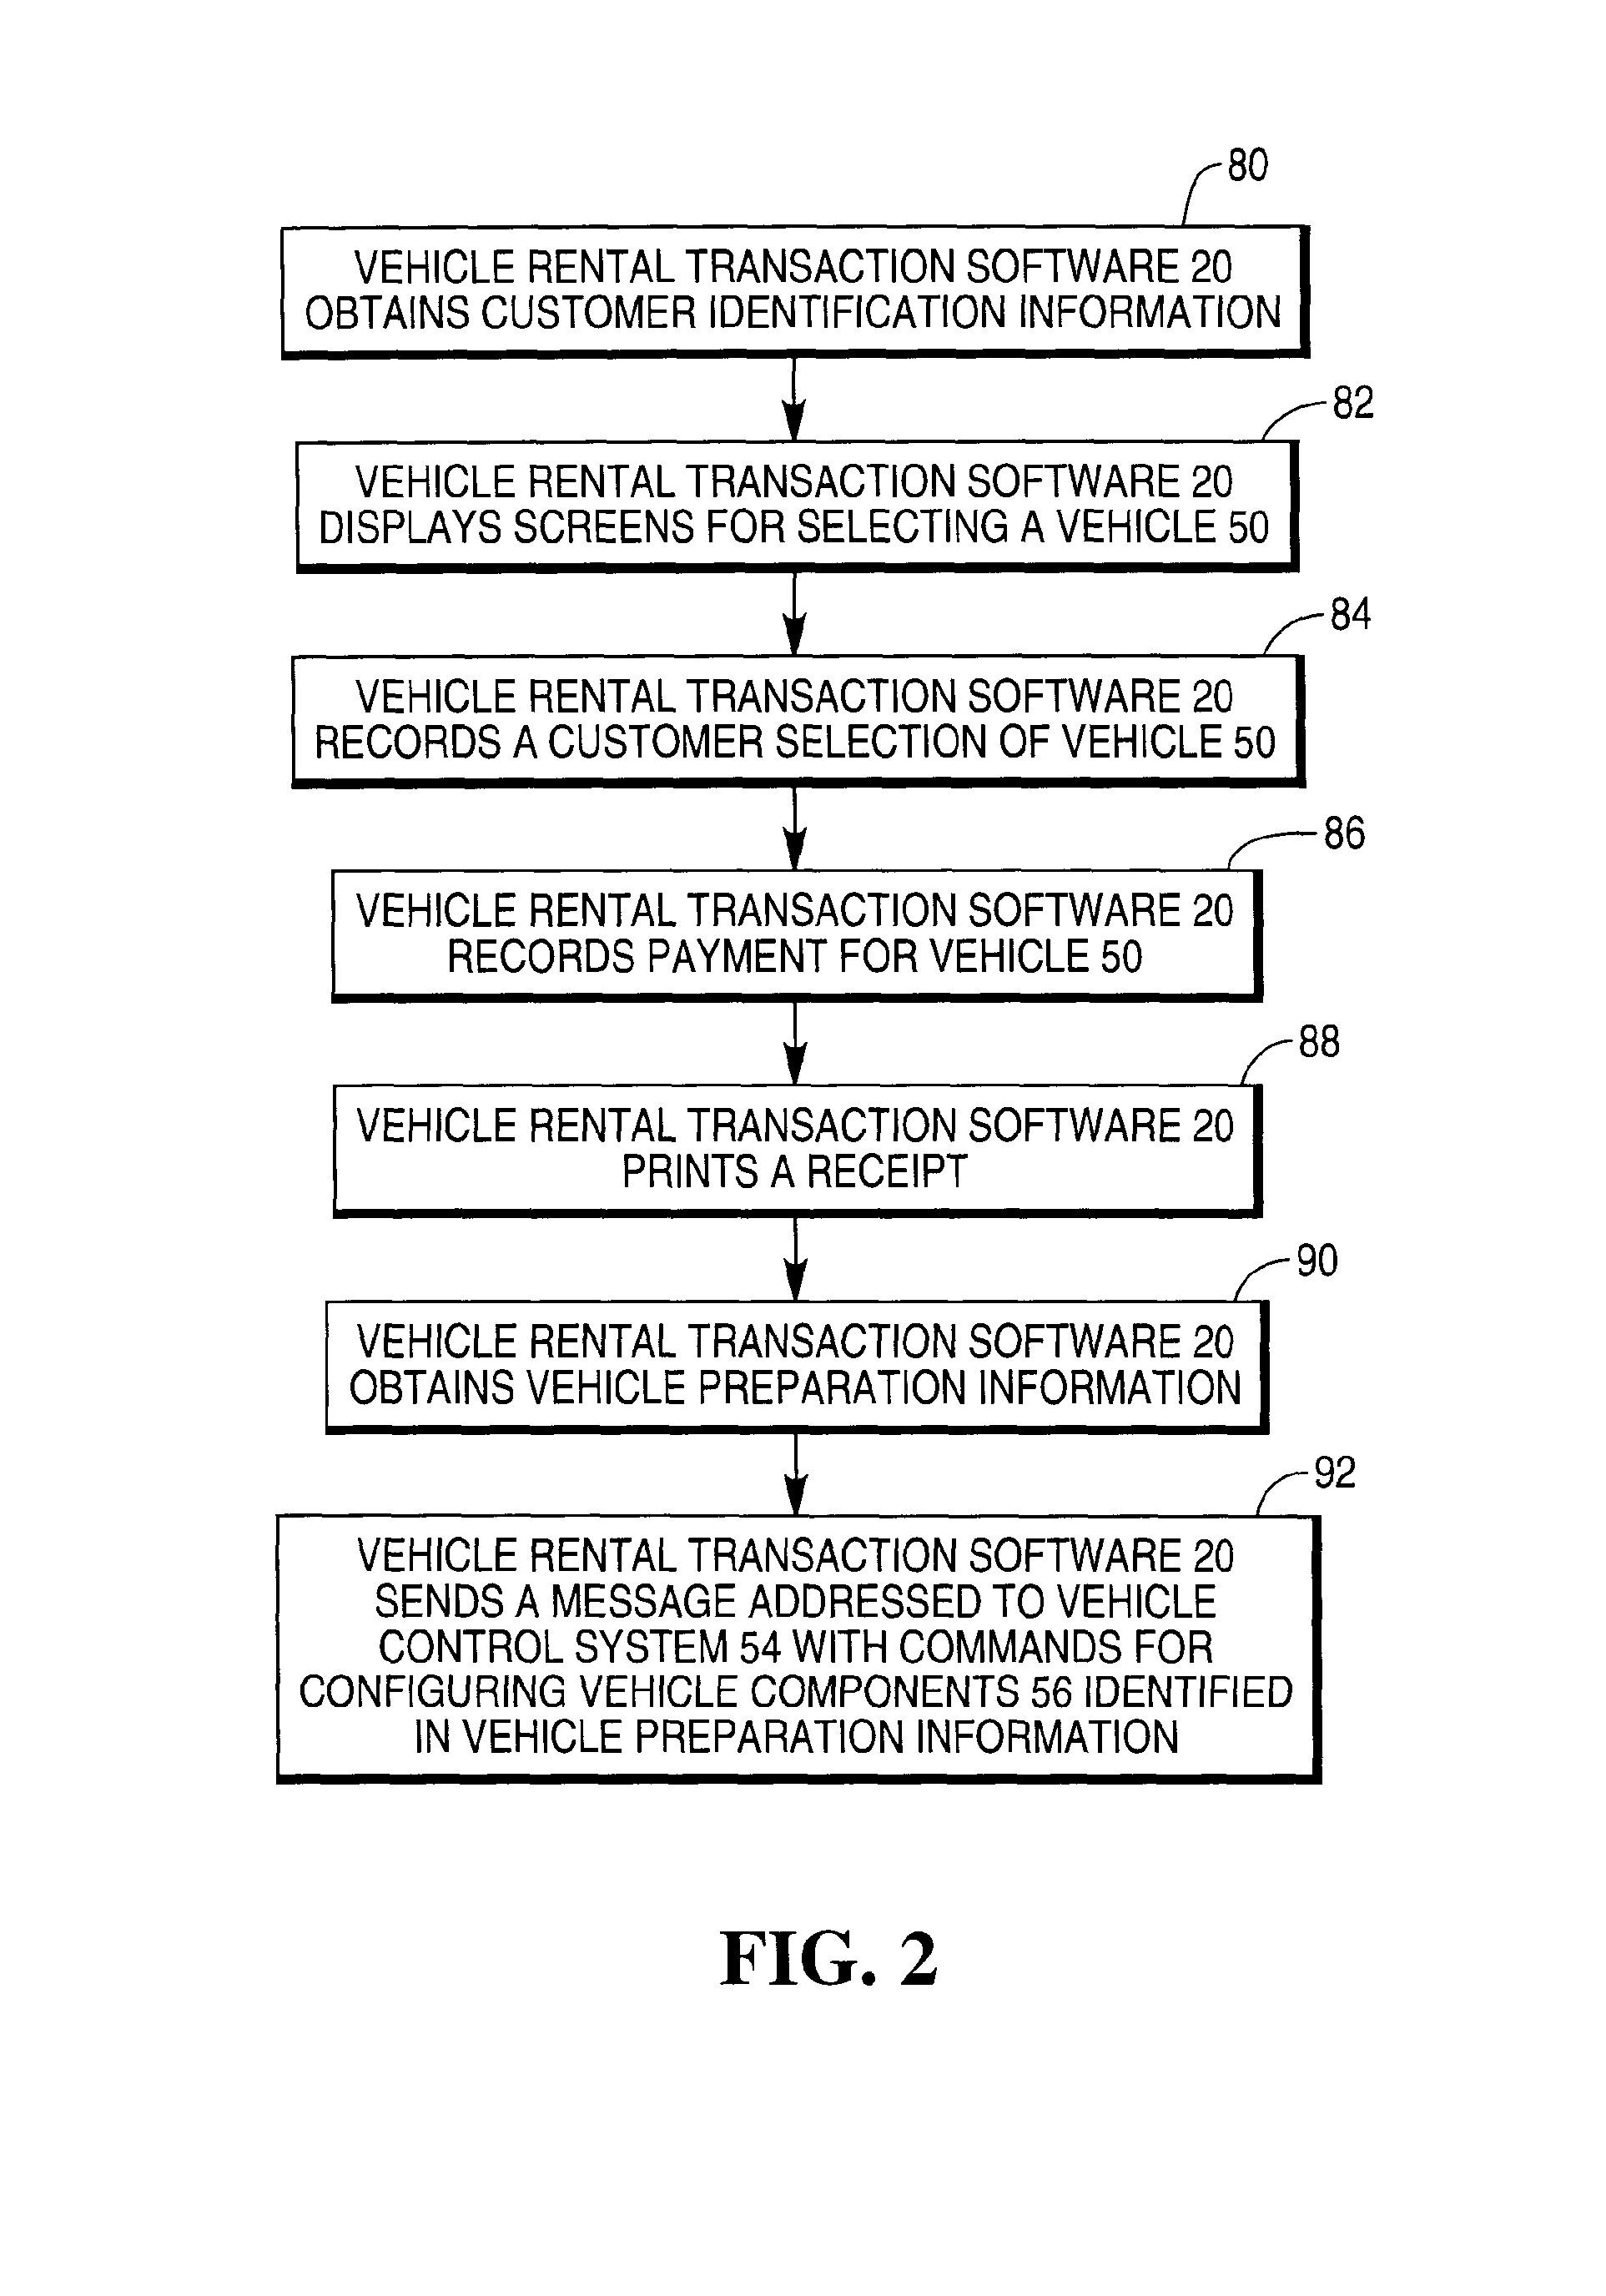 Car Rental Class Diagram Patent Ep A2 Vehicle Rental Transaction System and Method Of Car Rental Class Diagram